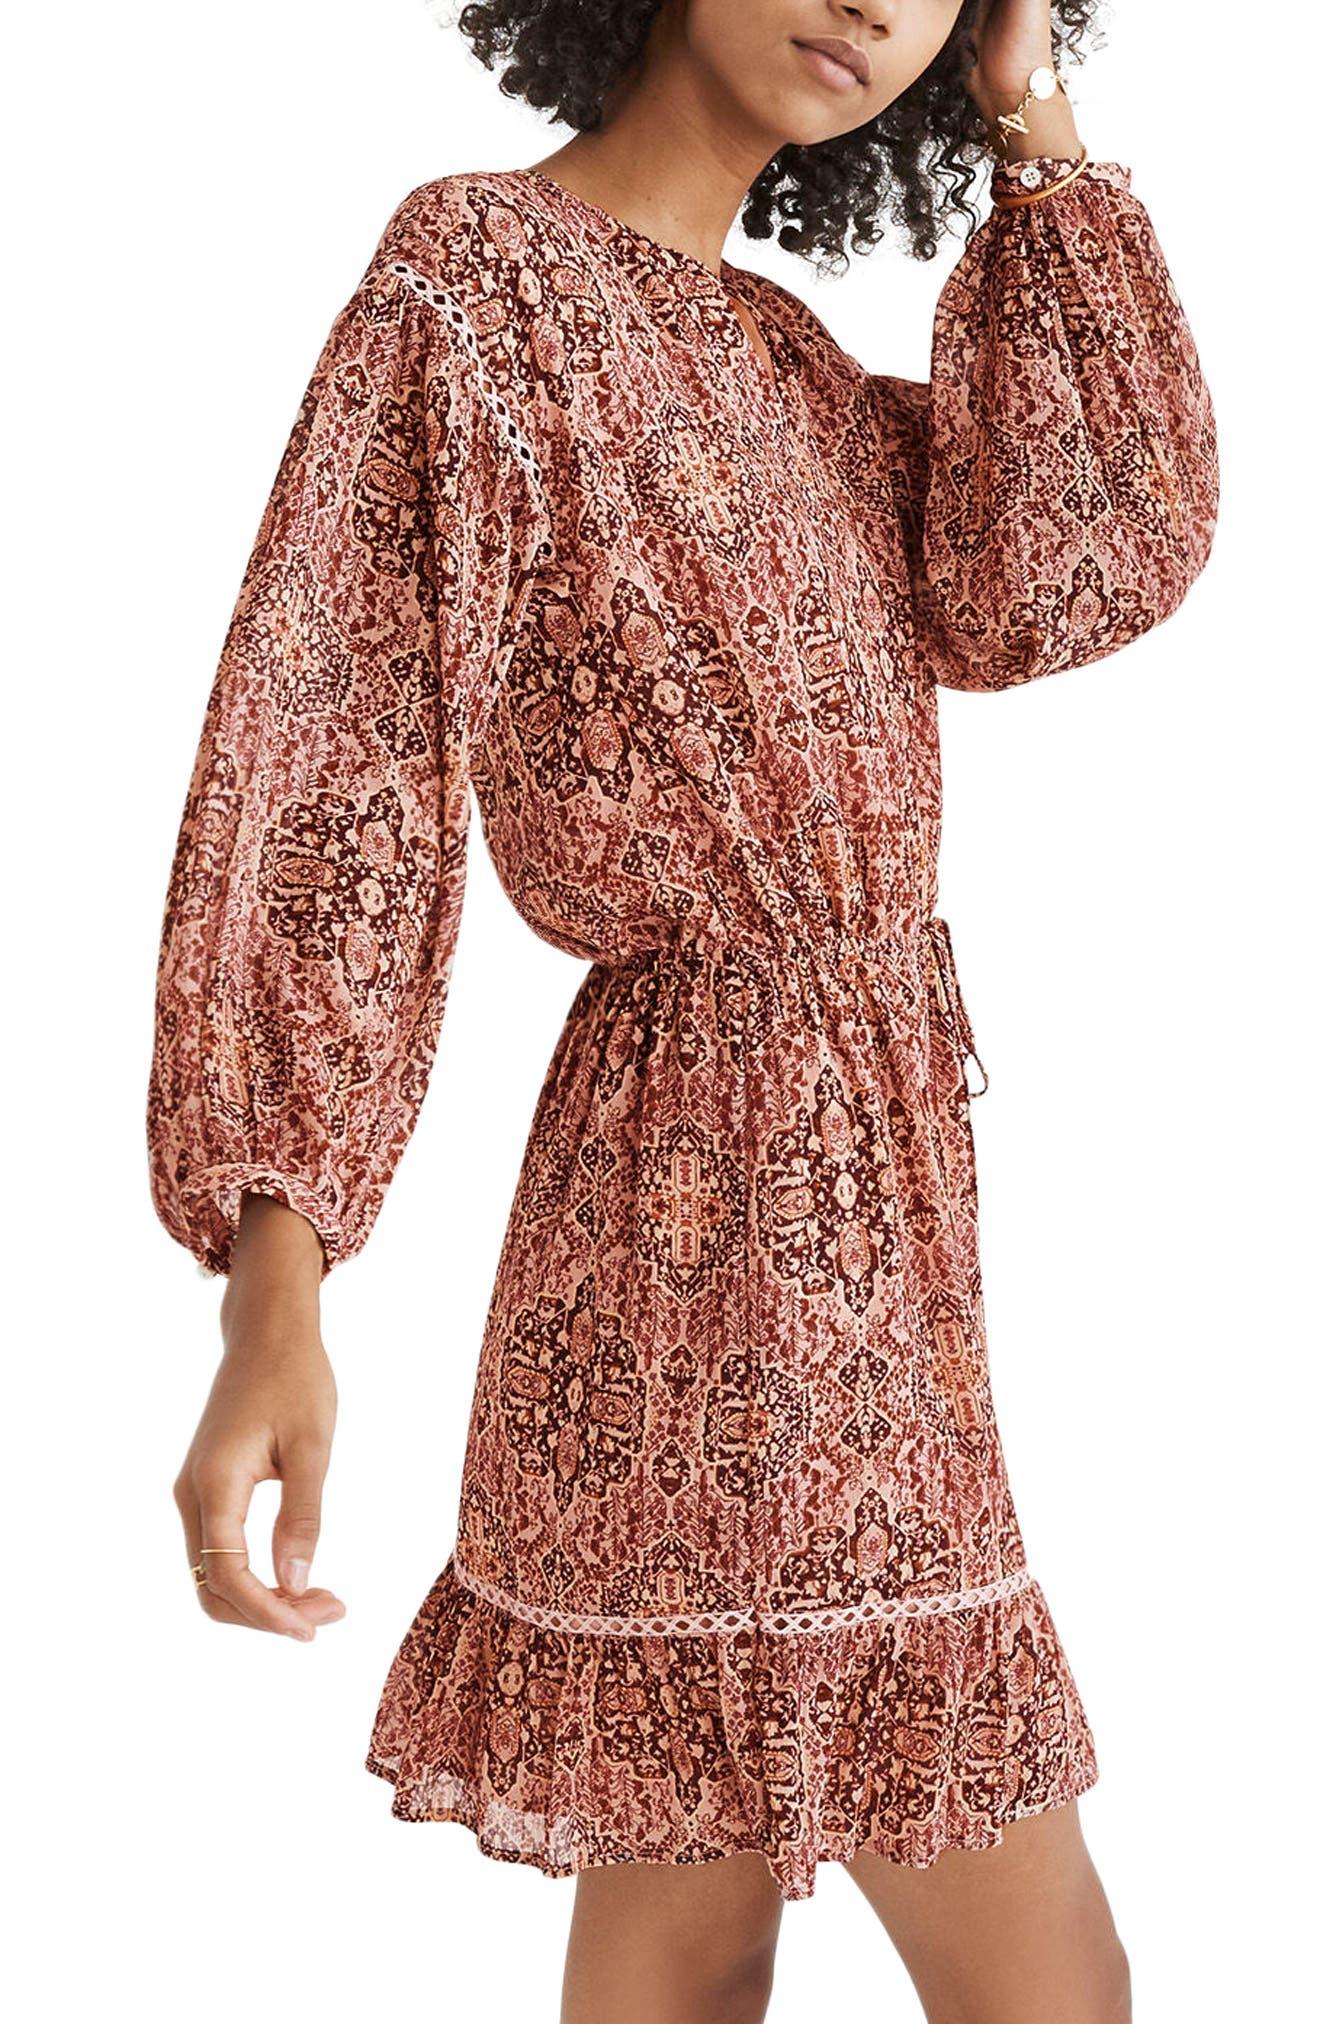 Drawstring Peasant Dress,                             Main thumbnail 1, color,                             Gentle Blush